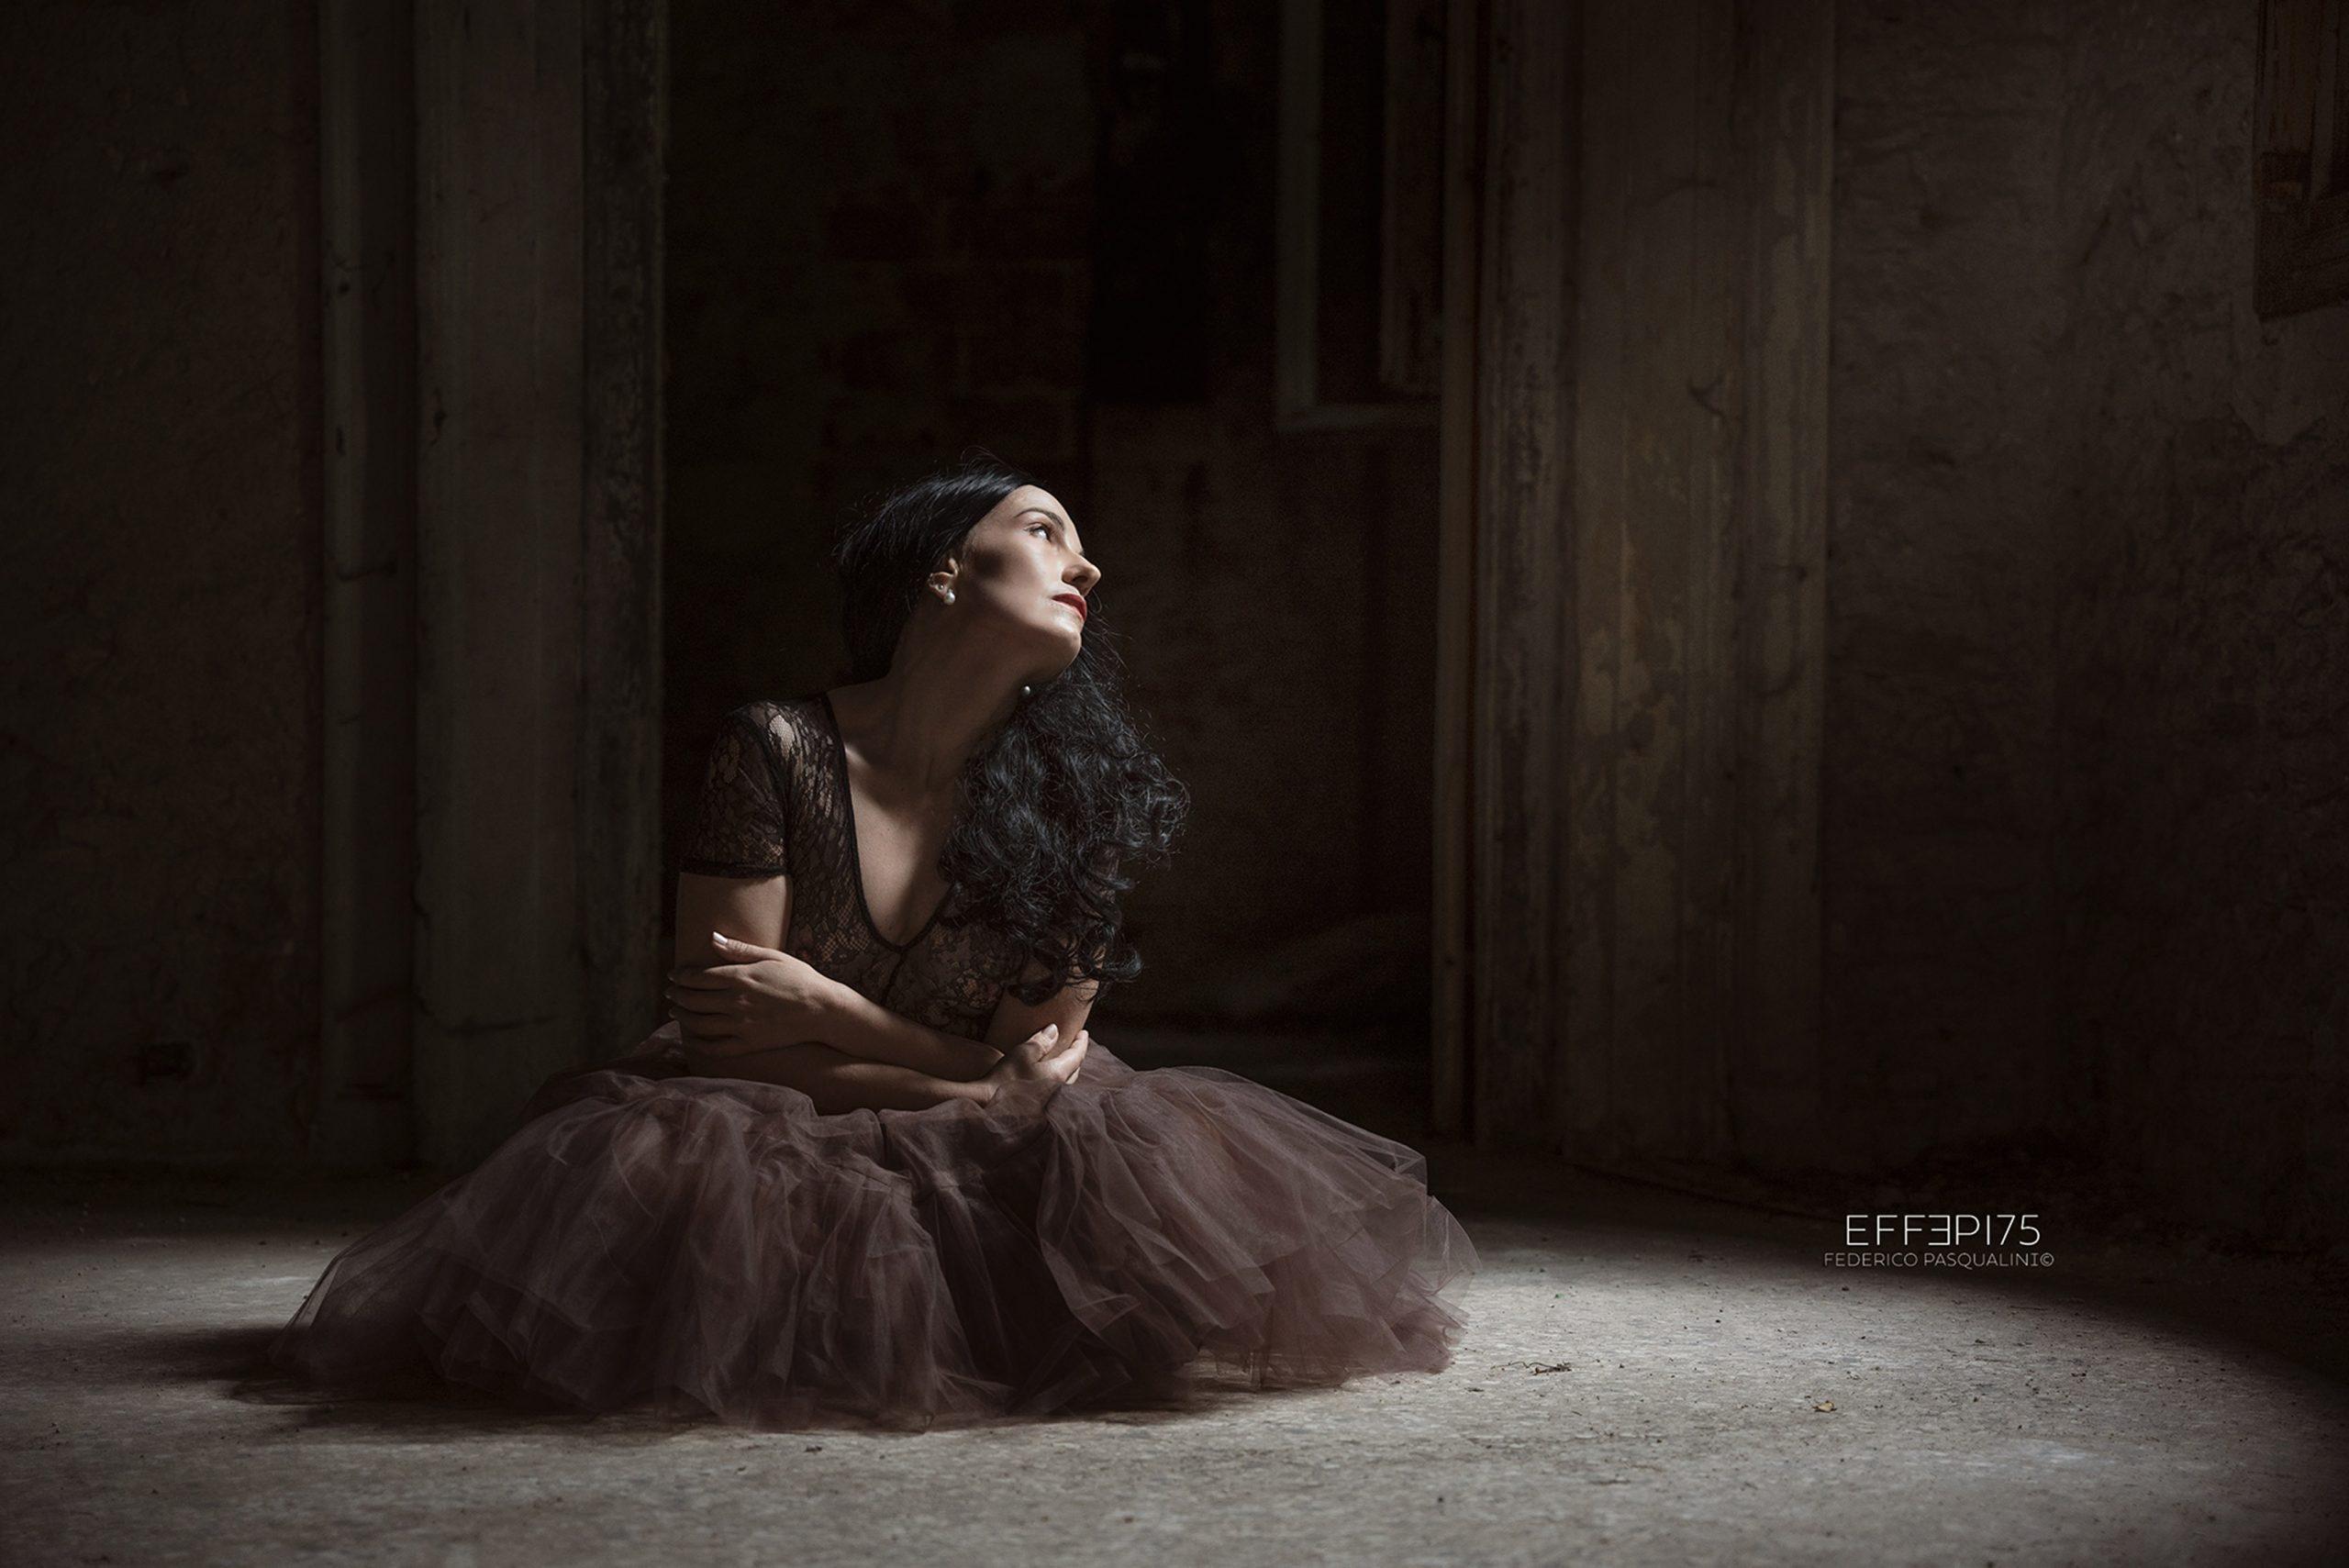 Categorie: Glamour, Portrait - Photographer: FEDERICO PASQUALINI - Model: ORIANA - Location: Vicenza, VI, Italia